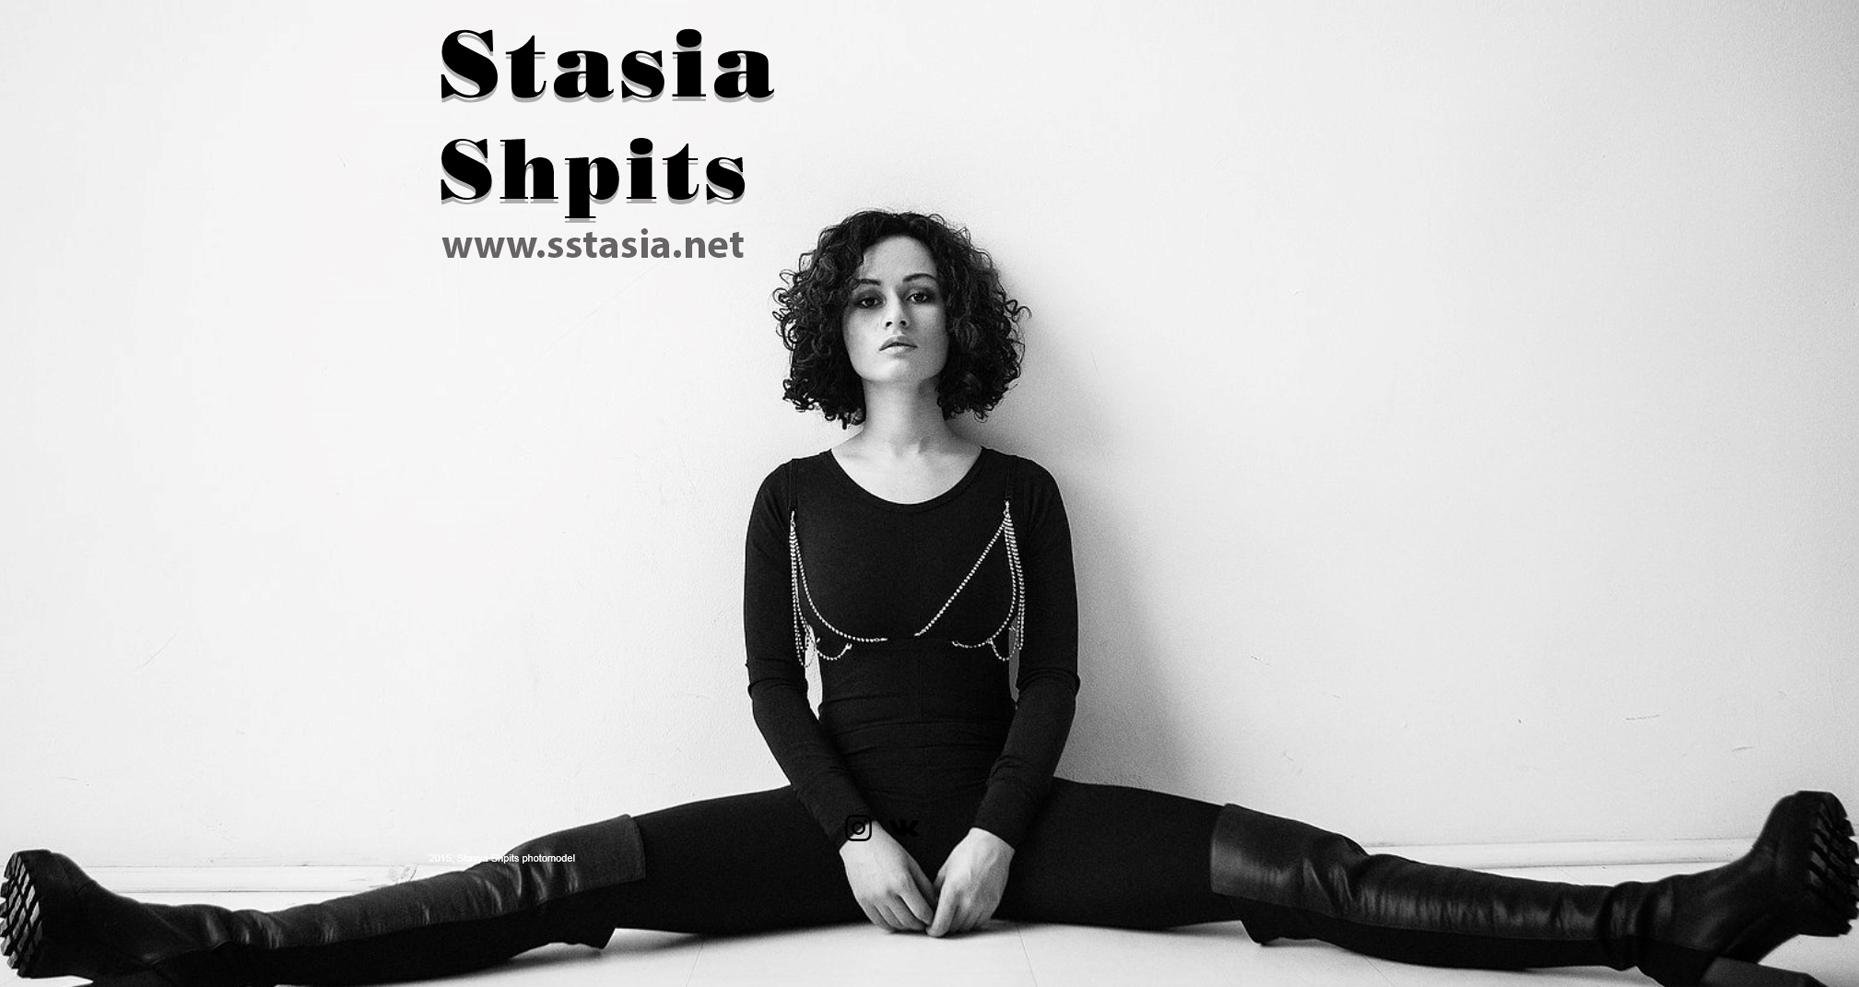 Стася Шпиц